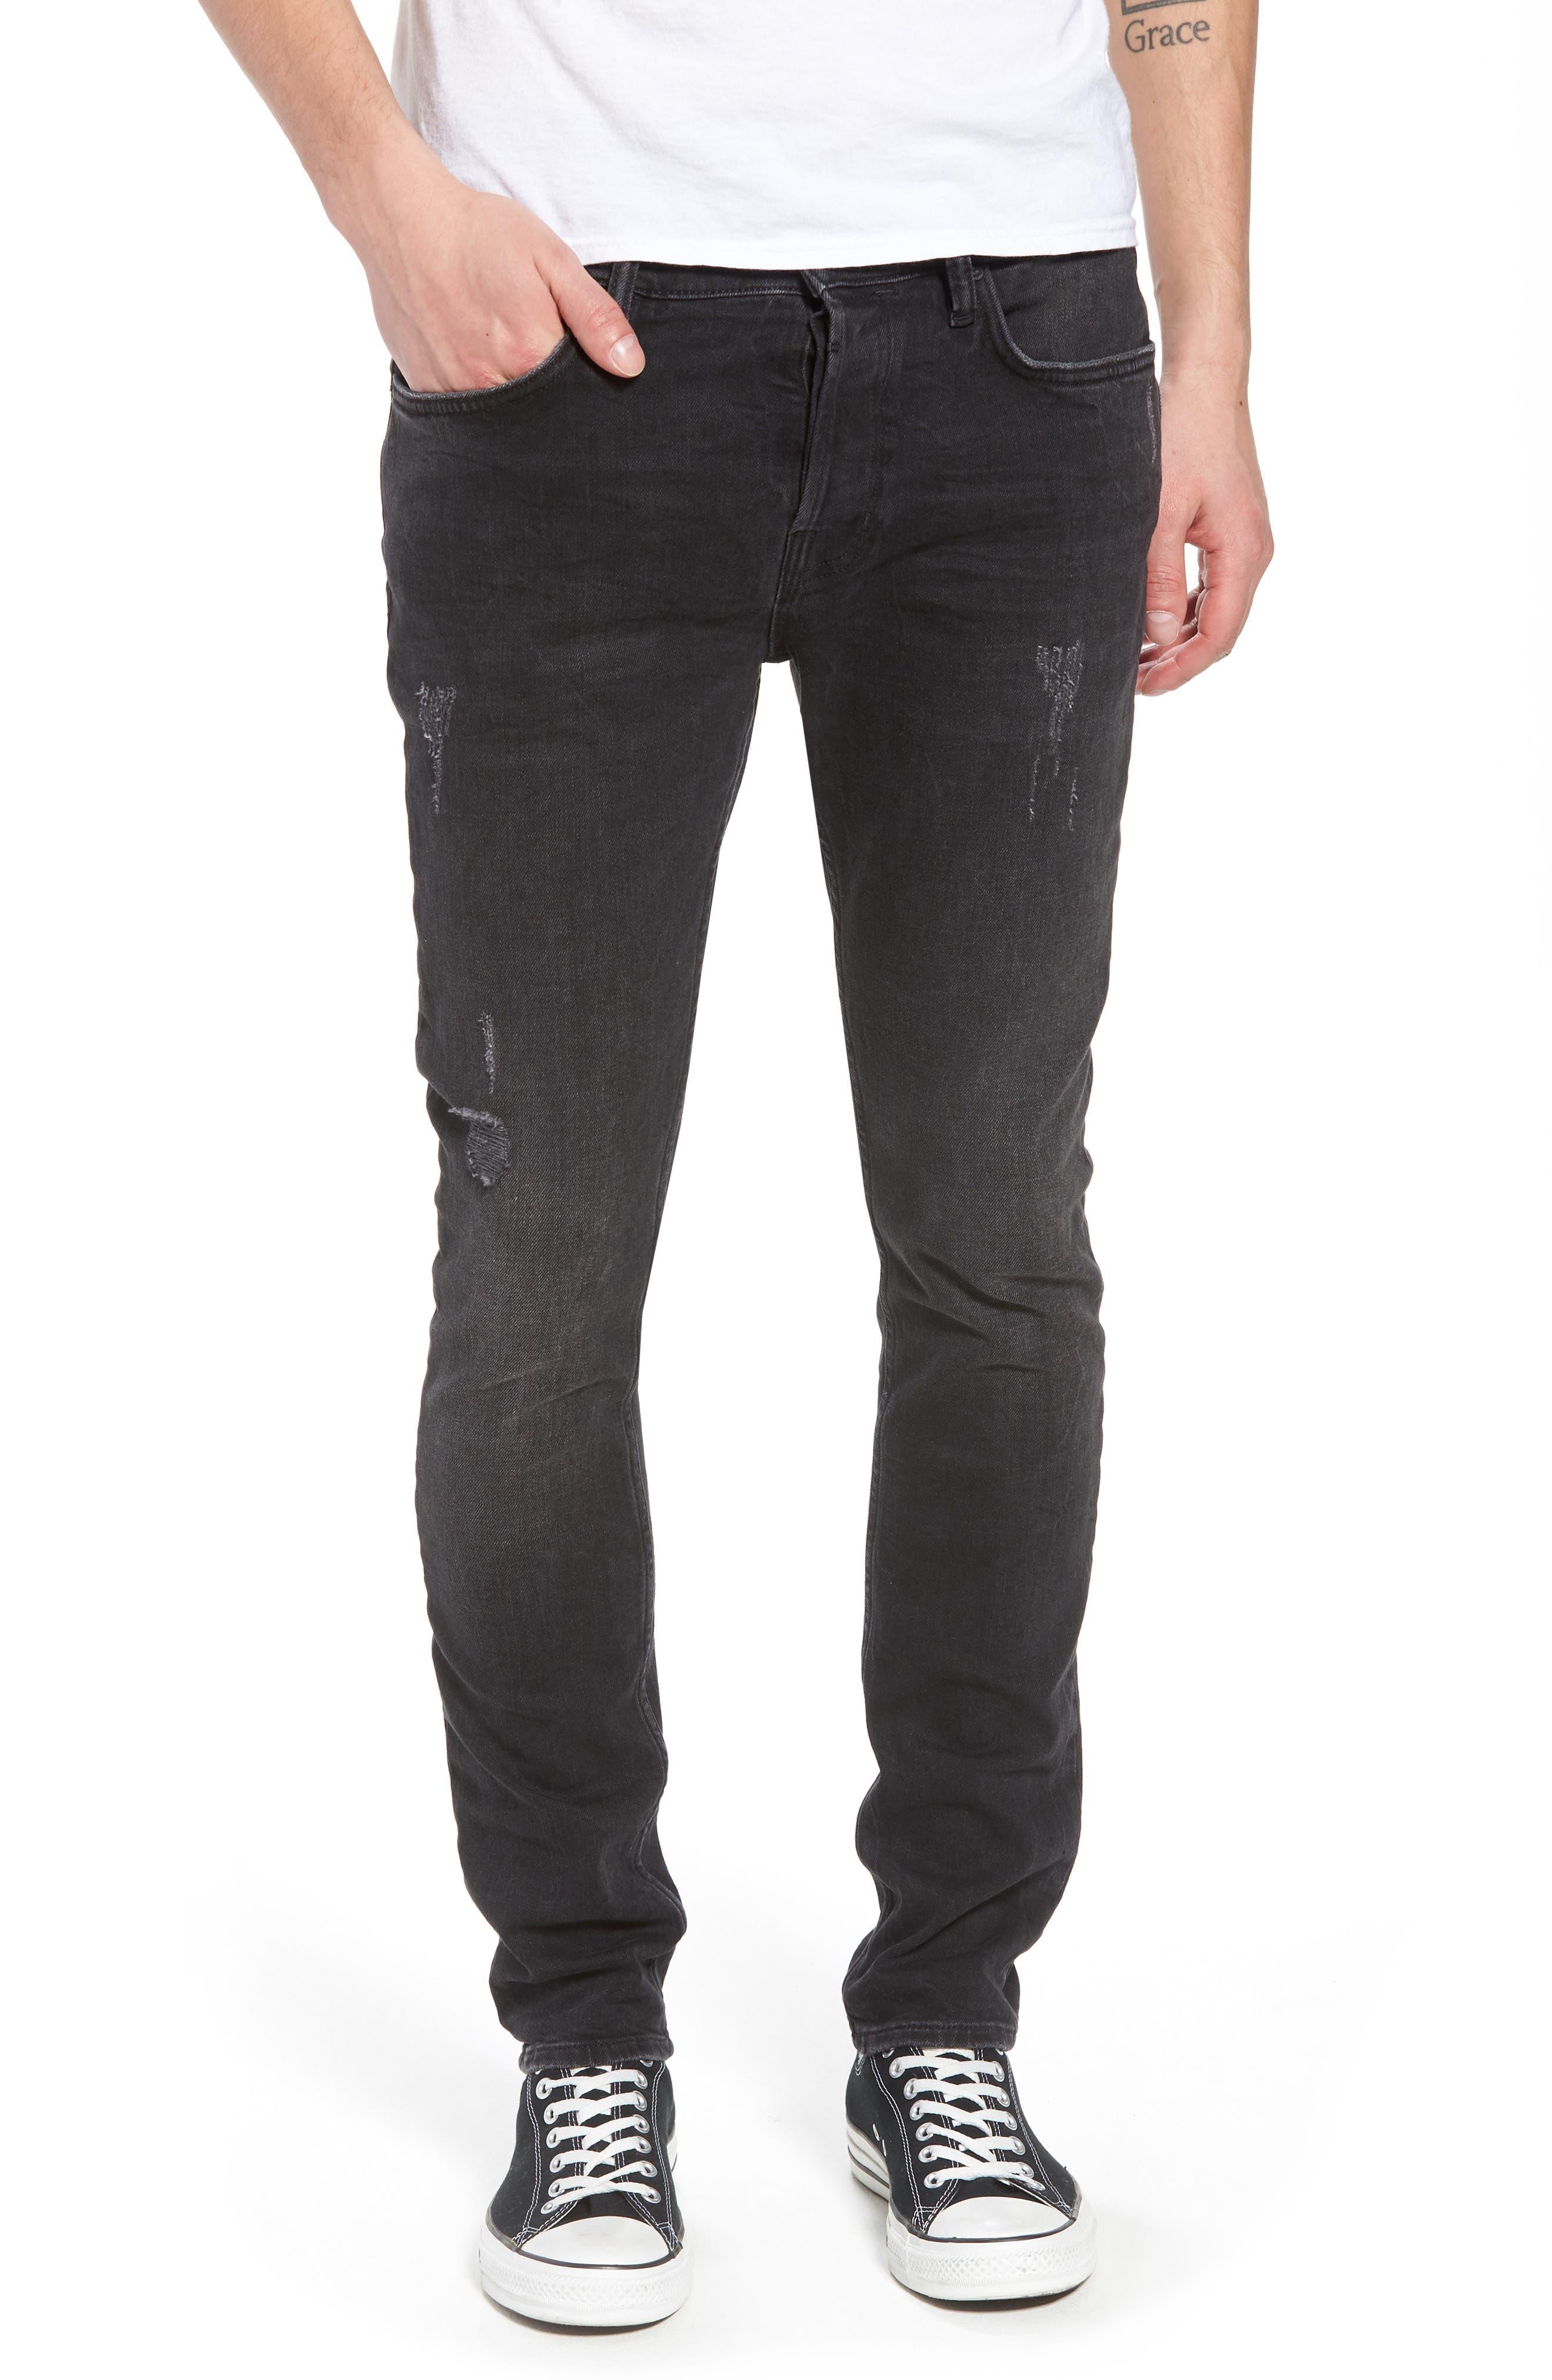 Raveline Skinny Fit Jeans,                             Main thumbnail 1, color,                             Black